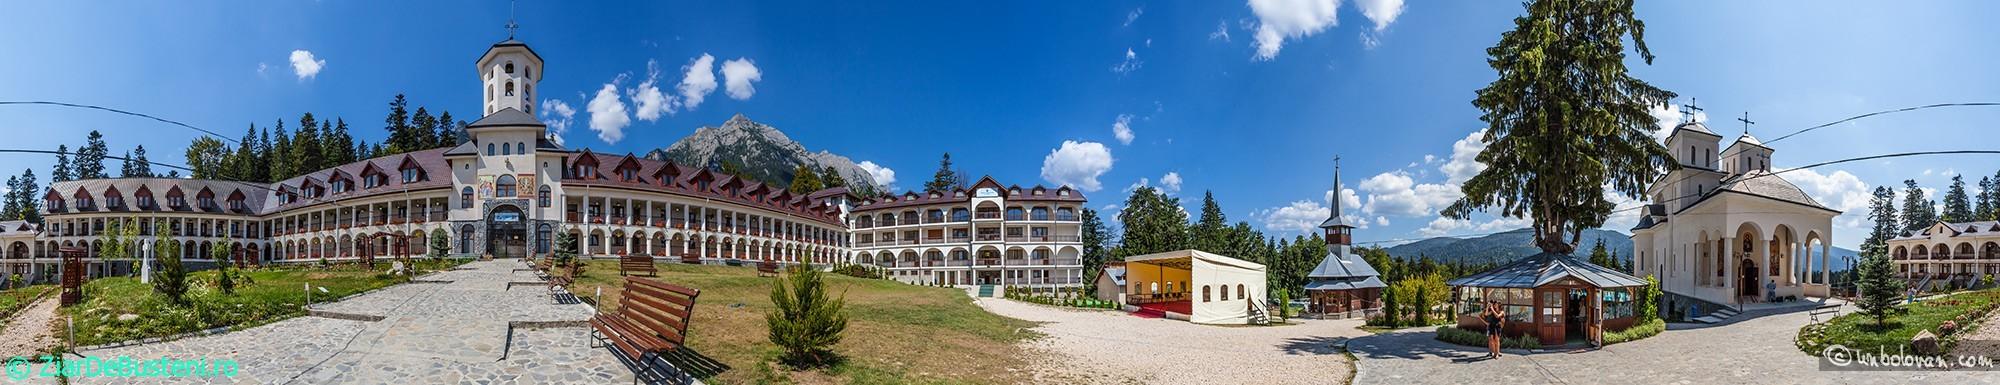 manastirea-caraiman-aug-2013MICA